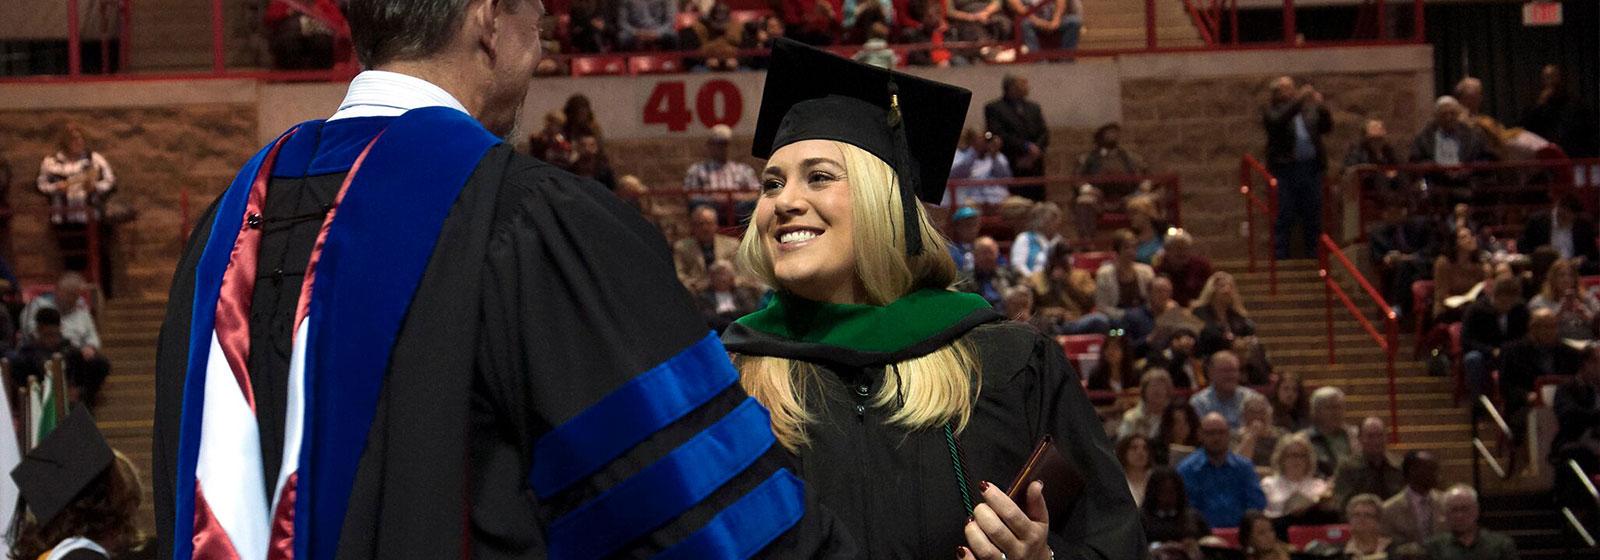 Texas State Graduation 2020.Commencement Registrar Msu Texas